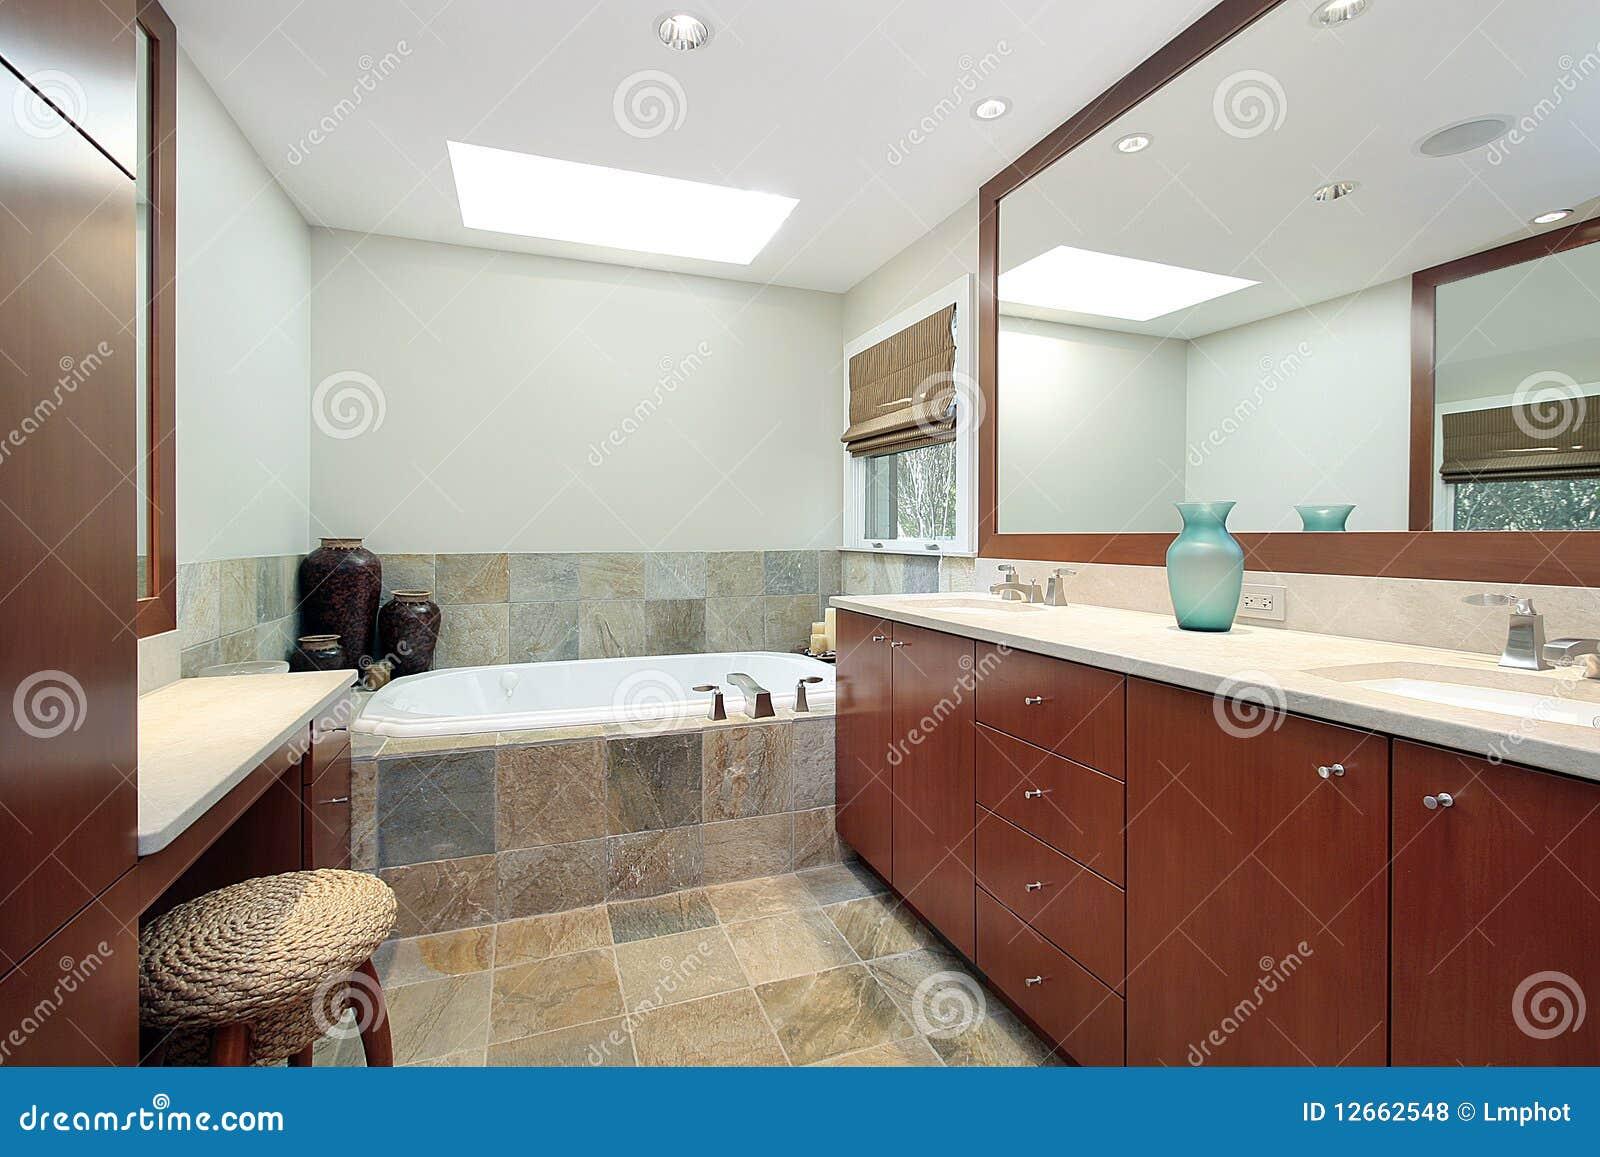 Leroy merlin fioriere ovali in pietra - Vasche da bagno ovali ...